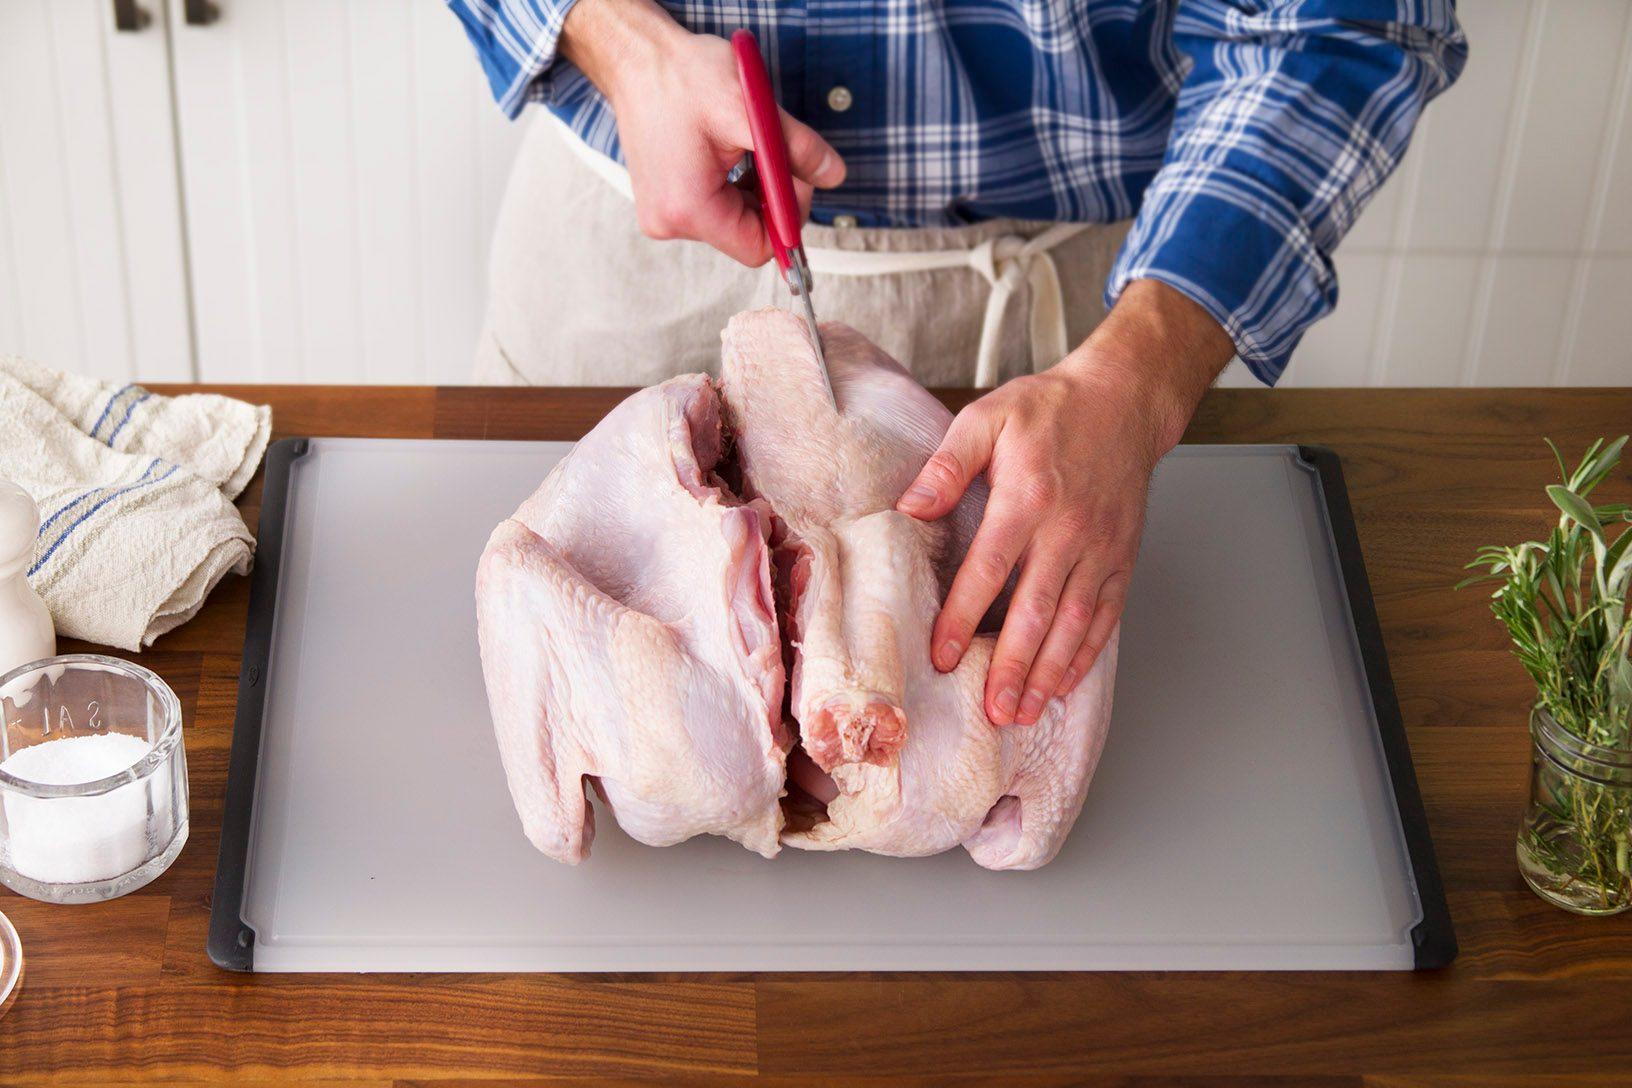 Person cutting the backbone out of a raw turkey carefully on a cutting board